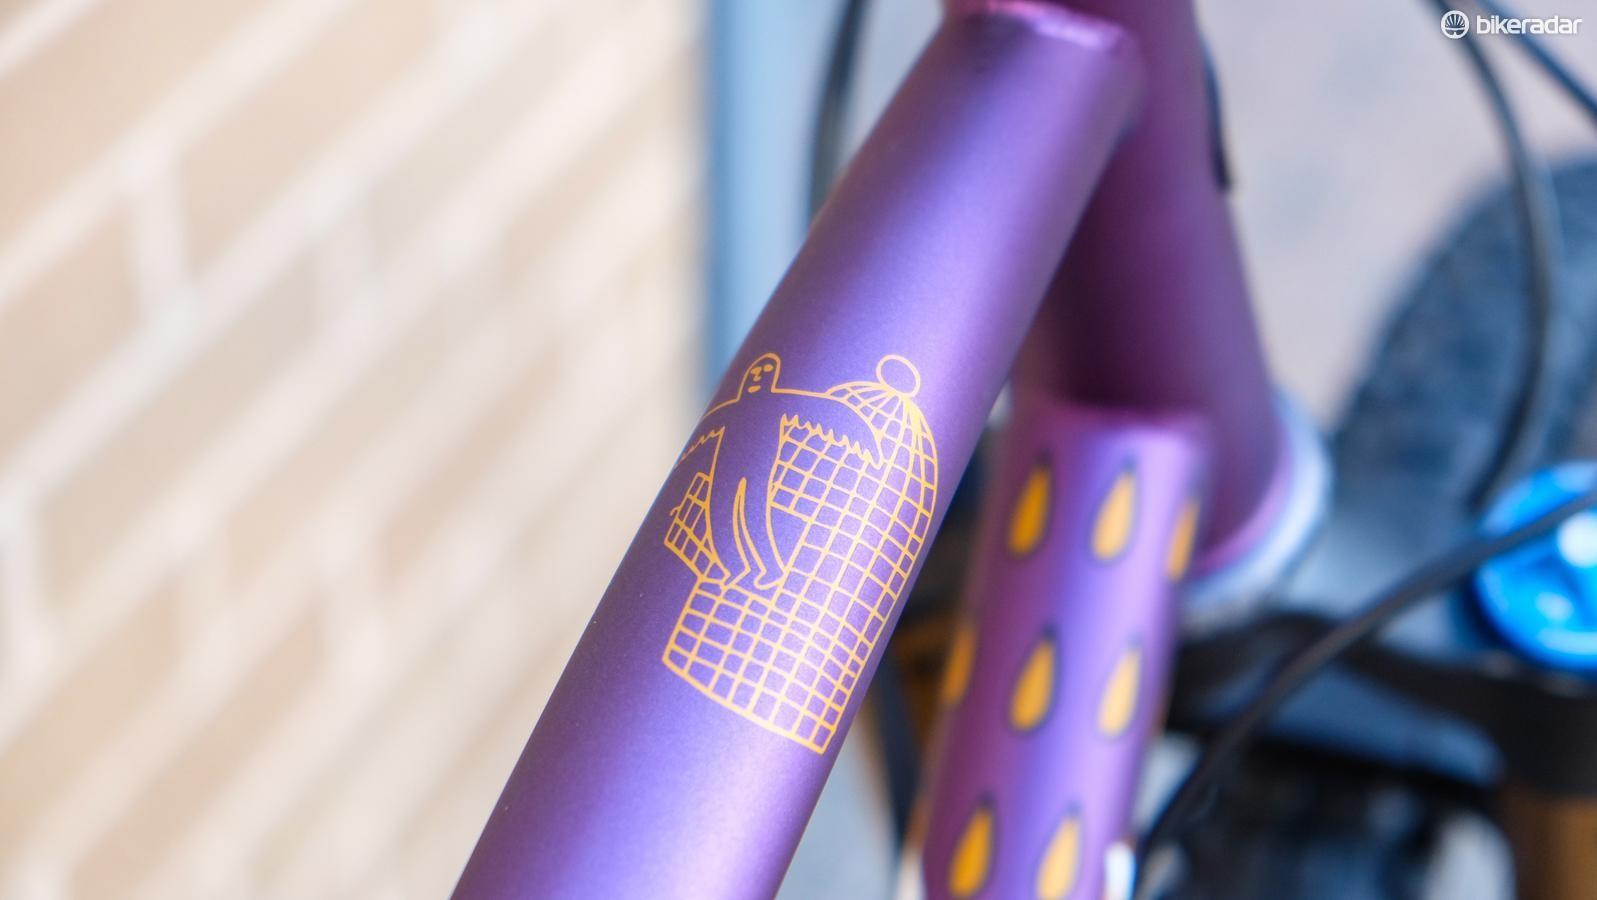 Details abound on this mountain bike